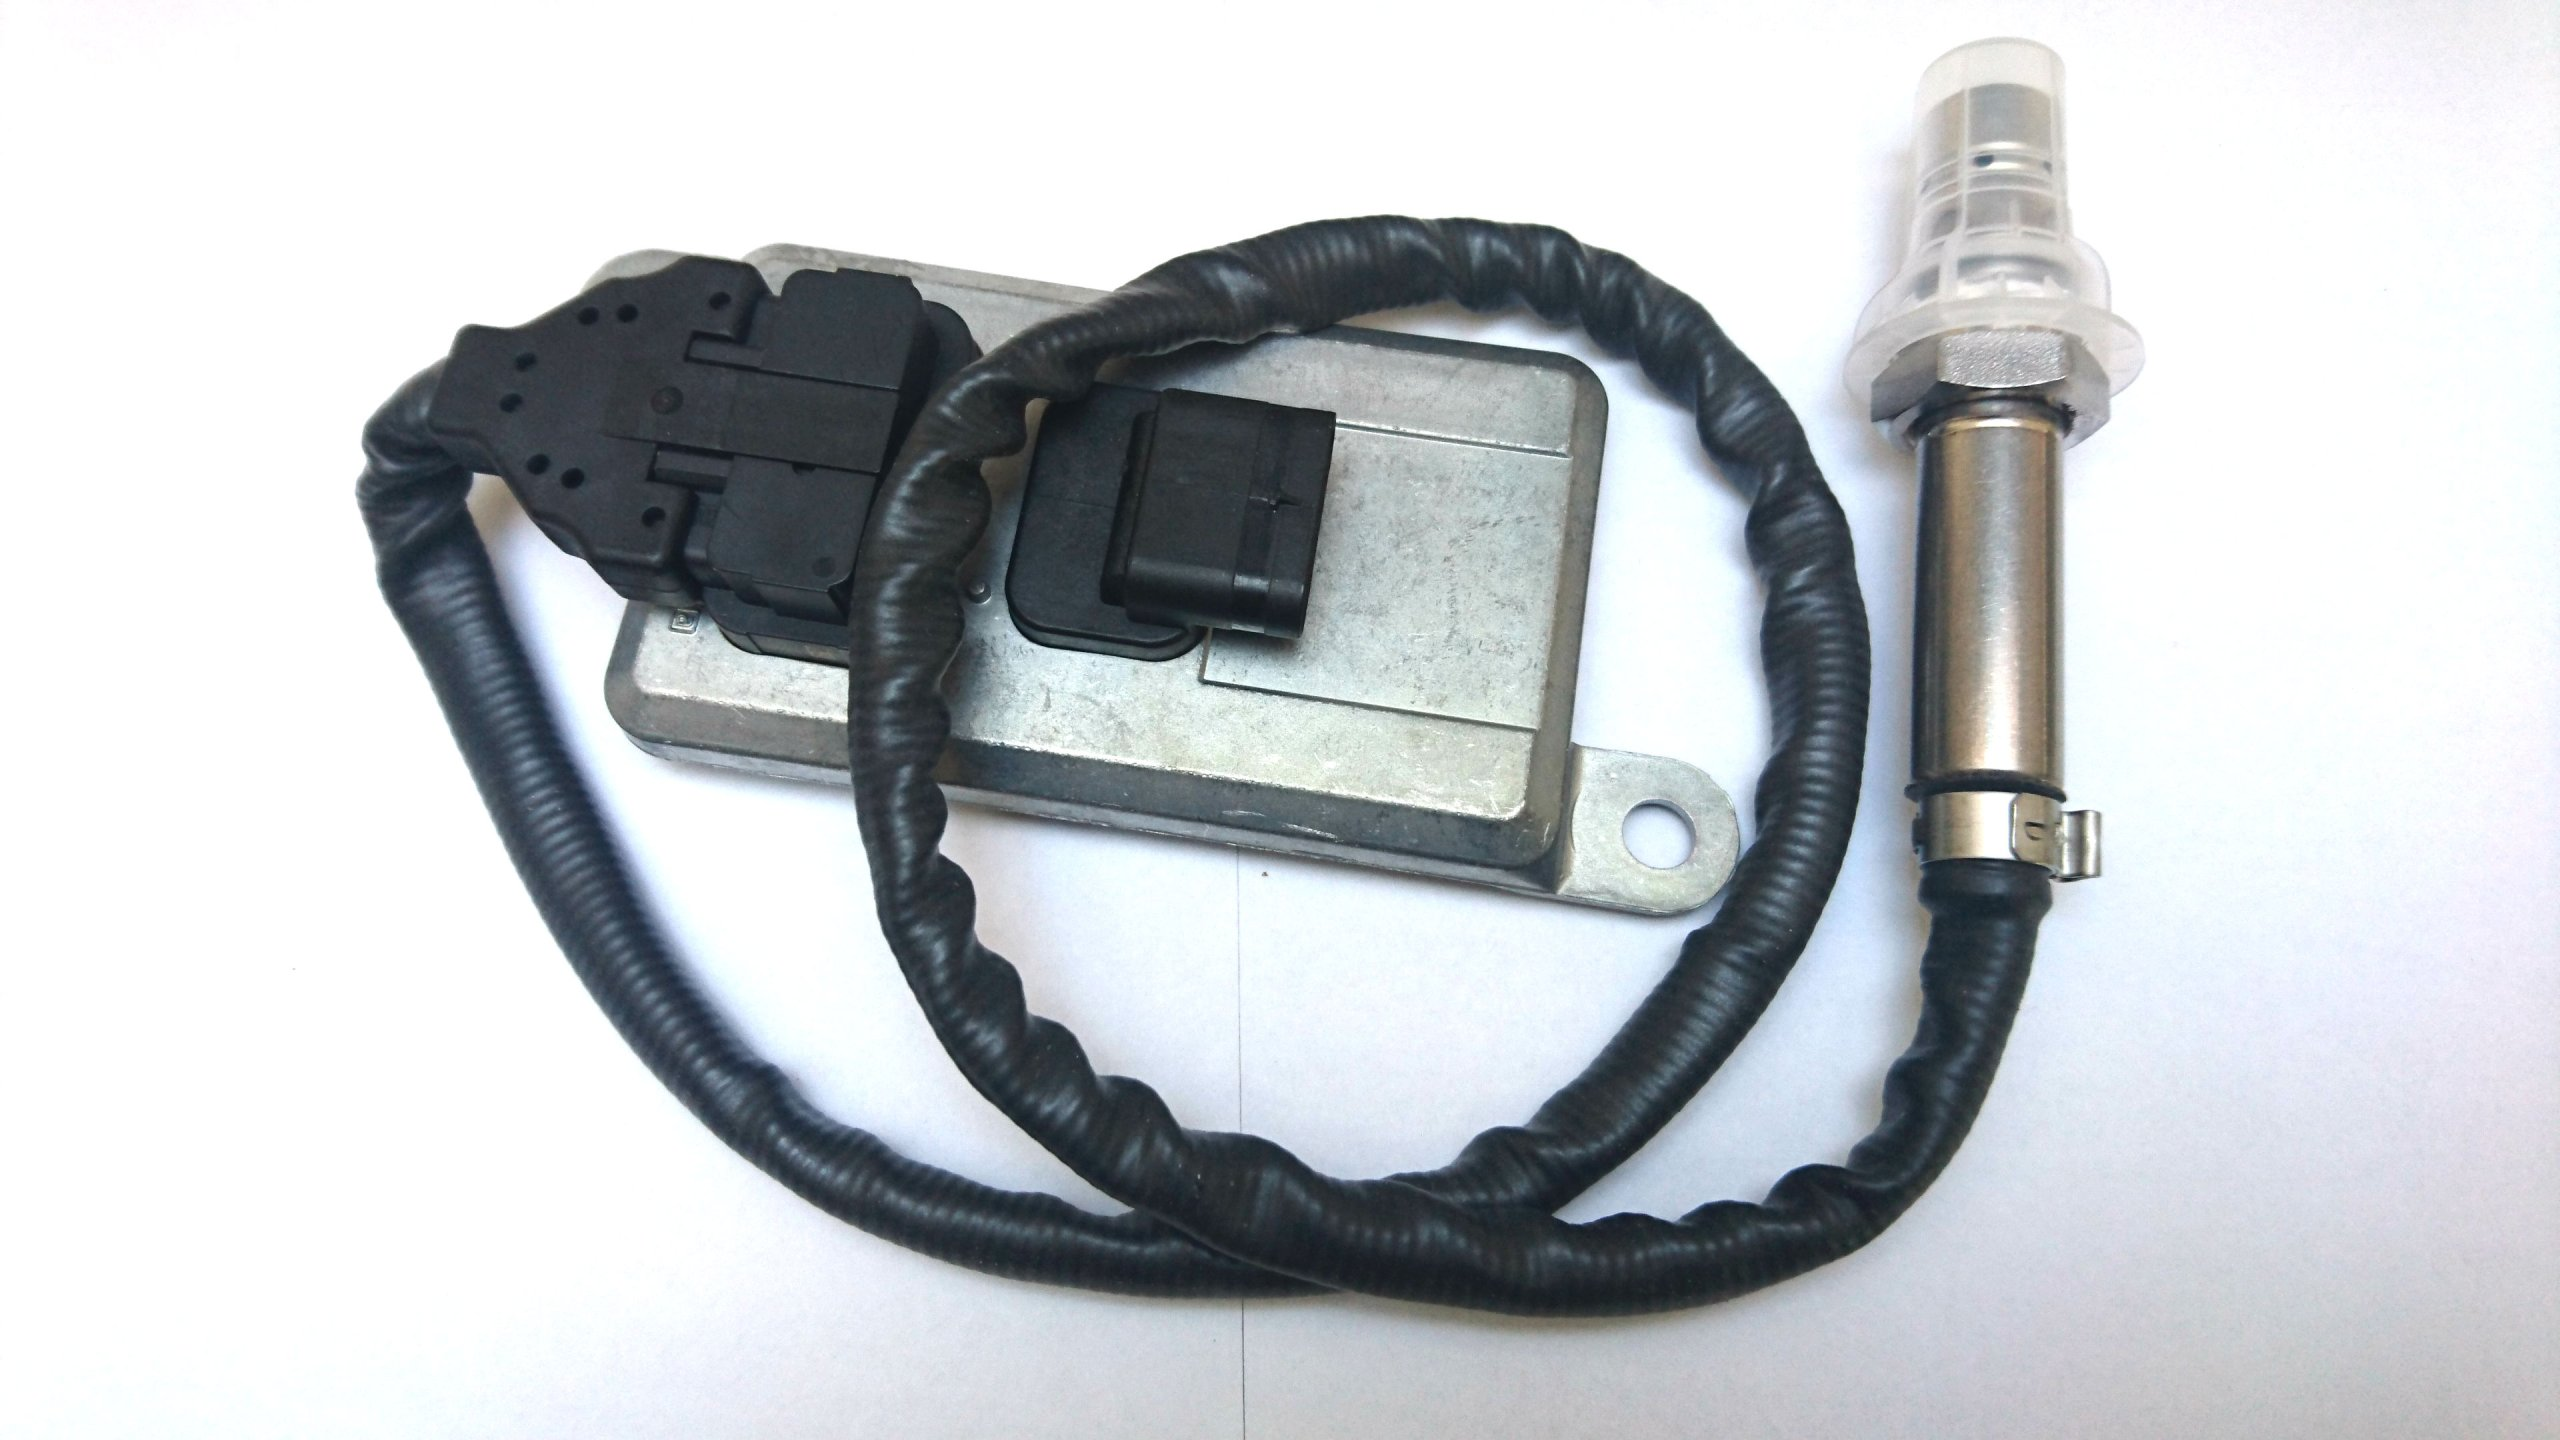 зонд датчик nox man tgx tgs tgl катализатор обмен